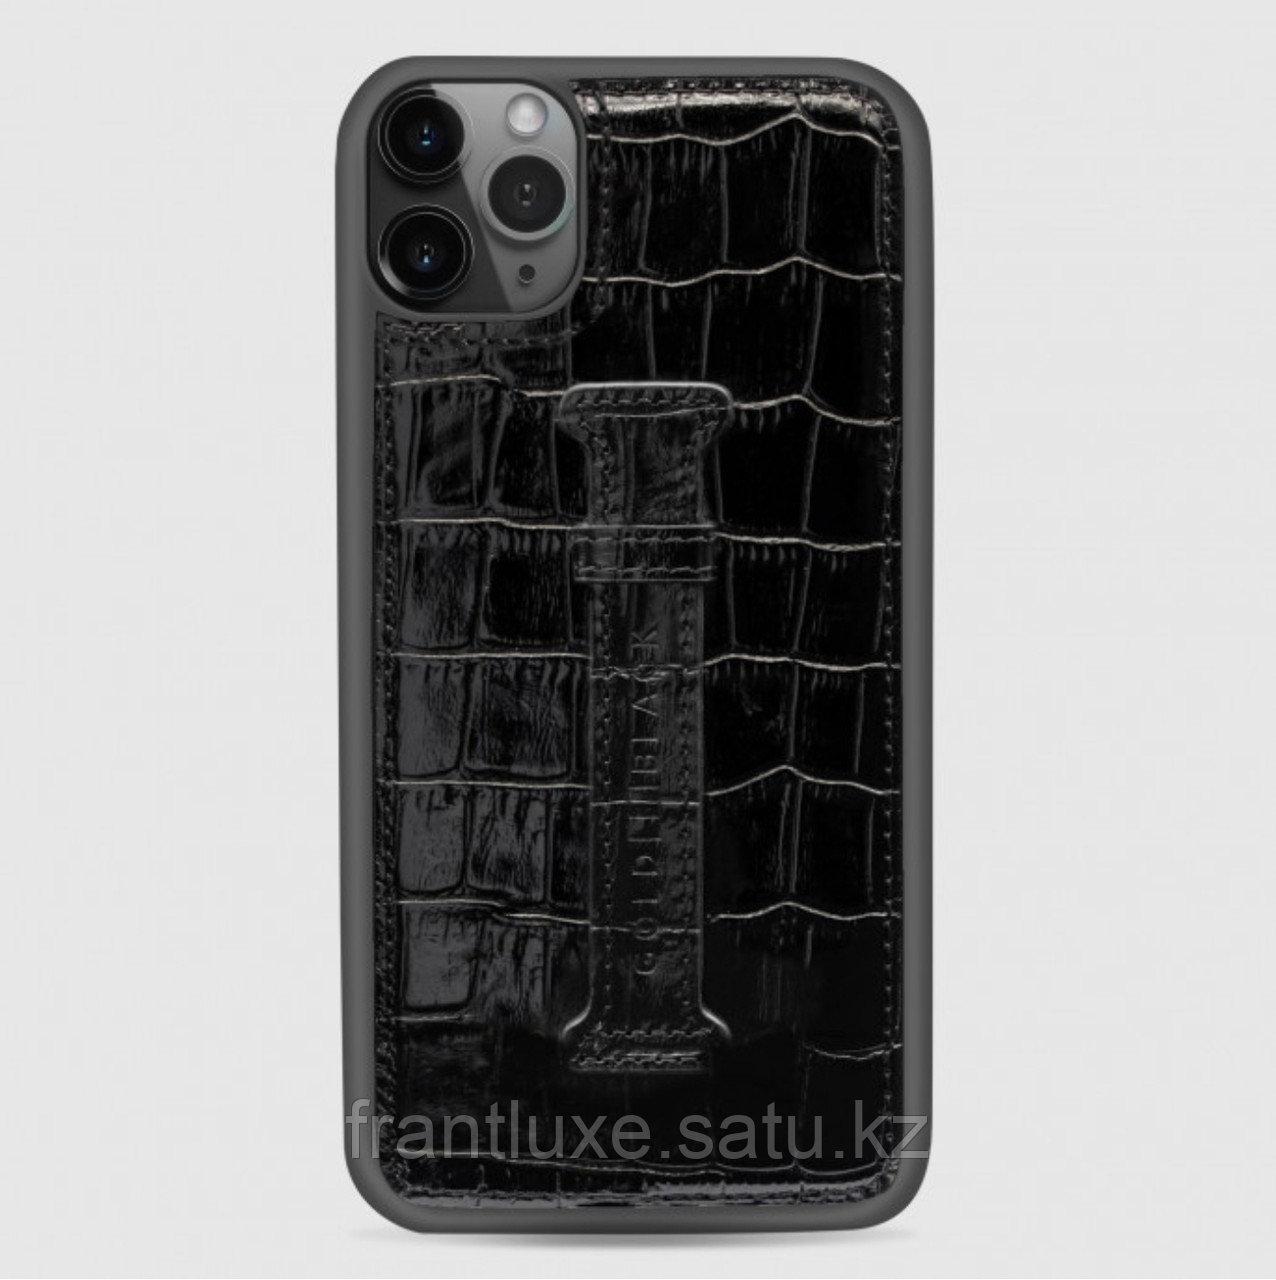 Чехол для телефона iPhone 11 Pro Max Finger-holder Black - фото 1